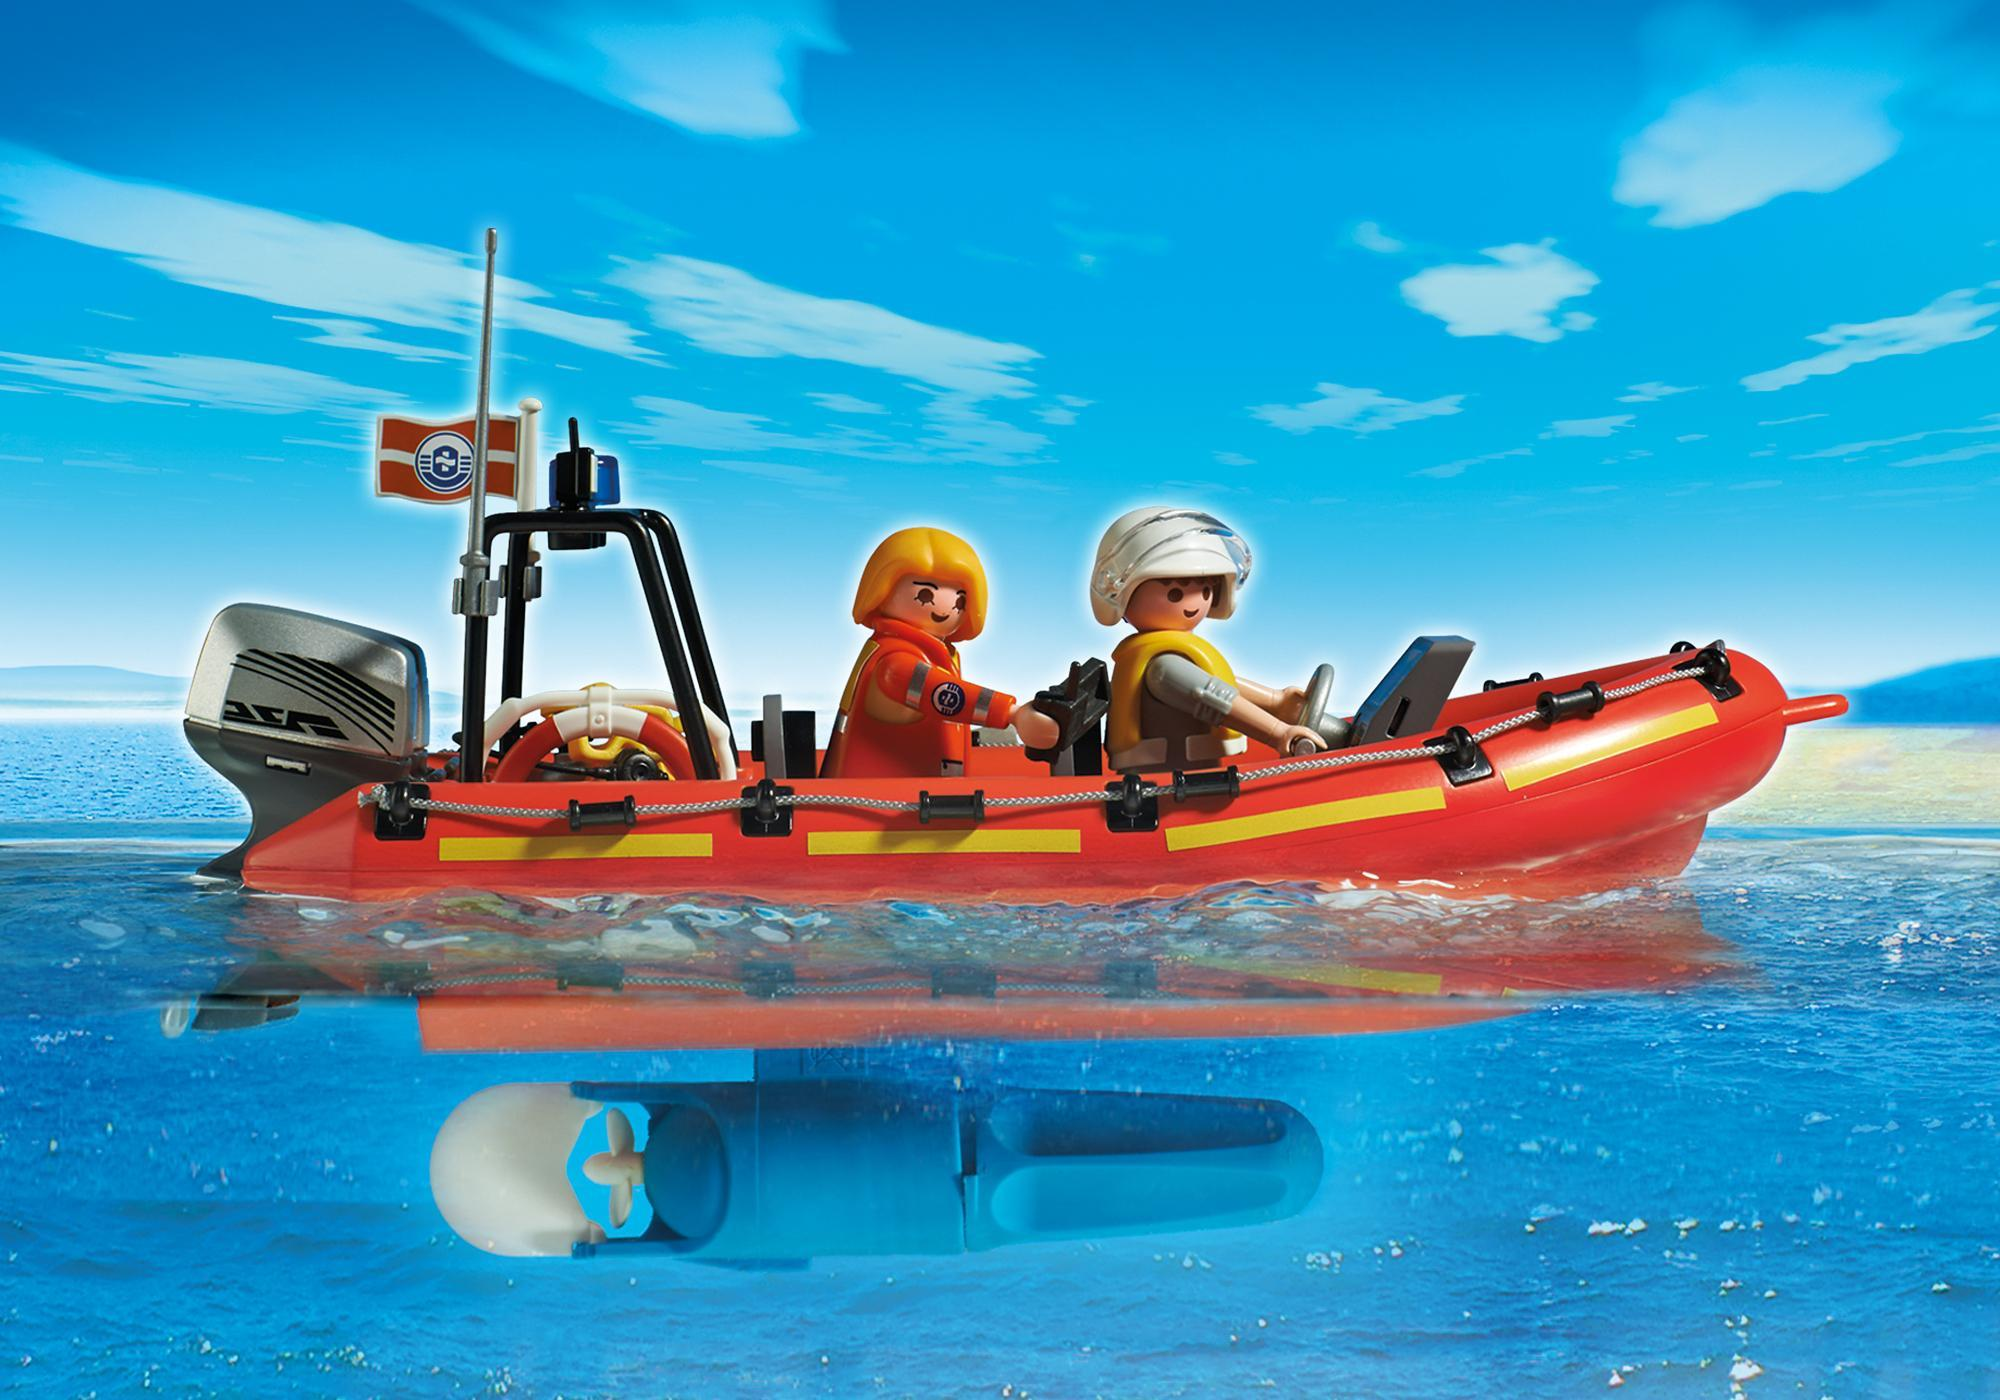 http://media.playmobil.com/i/playmobil/5539_product_extra1/Coast Guard Station with Lighthouse